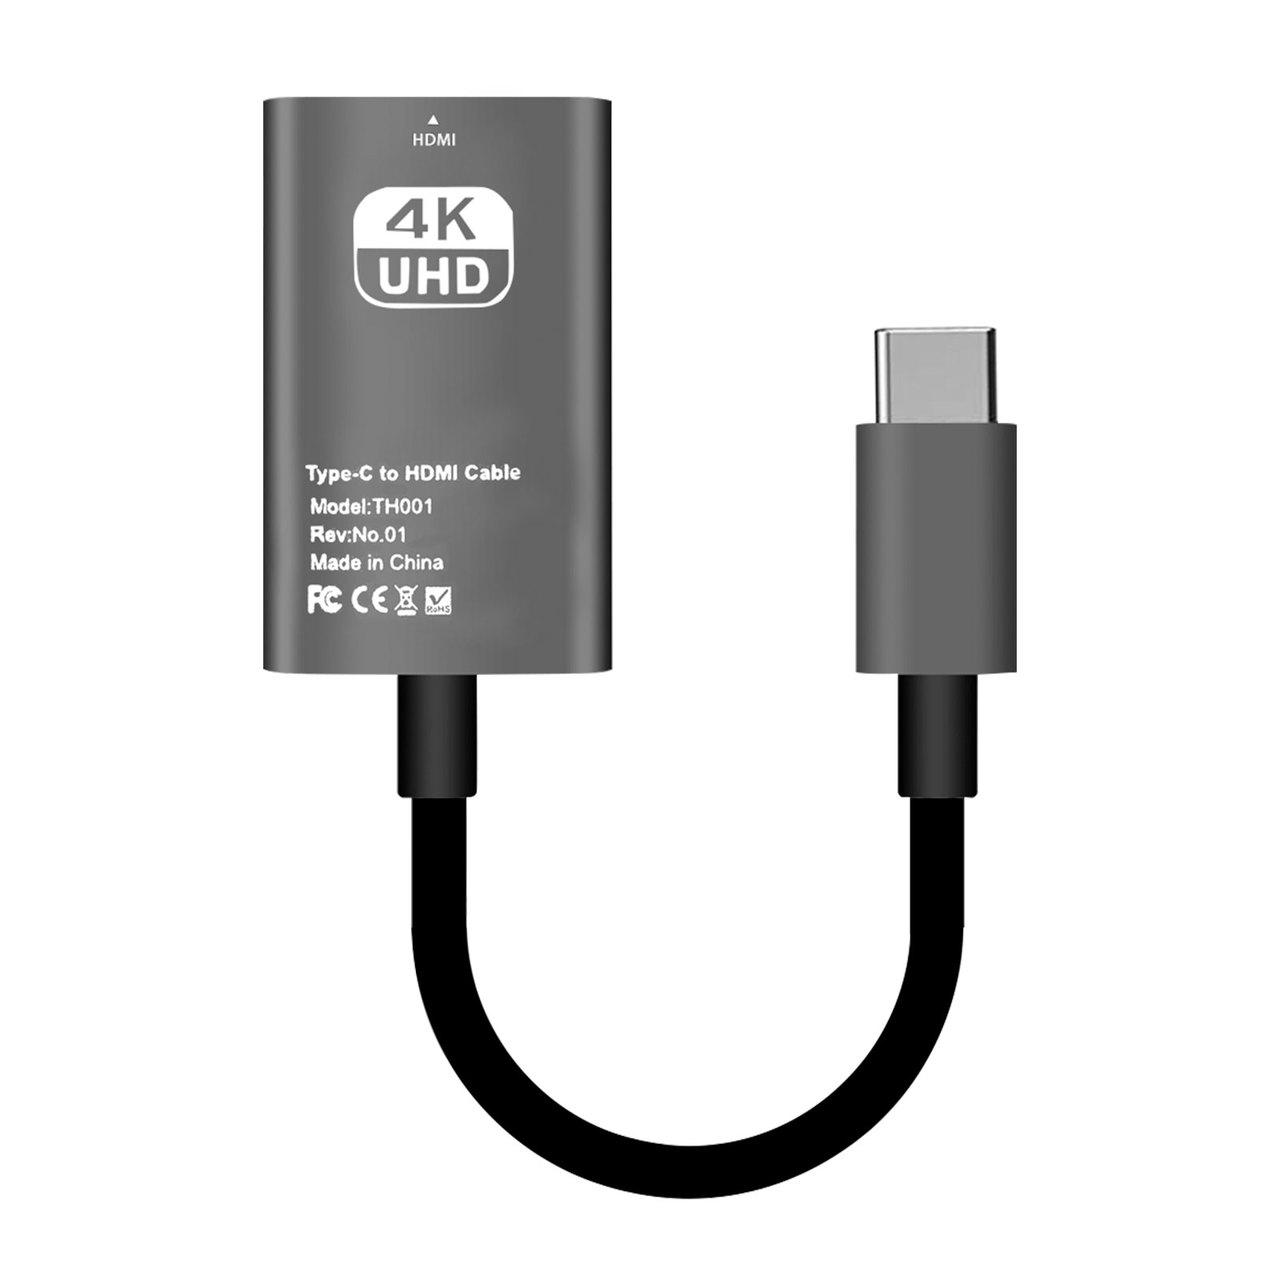 Cáp chuyển Type-c ra HDMI 4K cho Macbook, Surface, Dell XPS